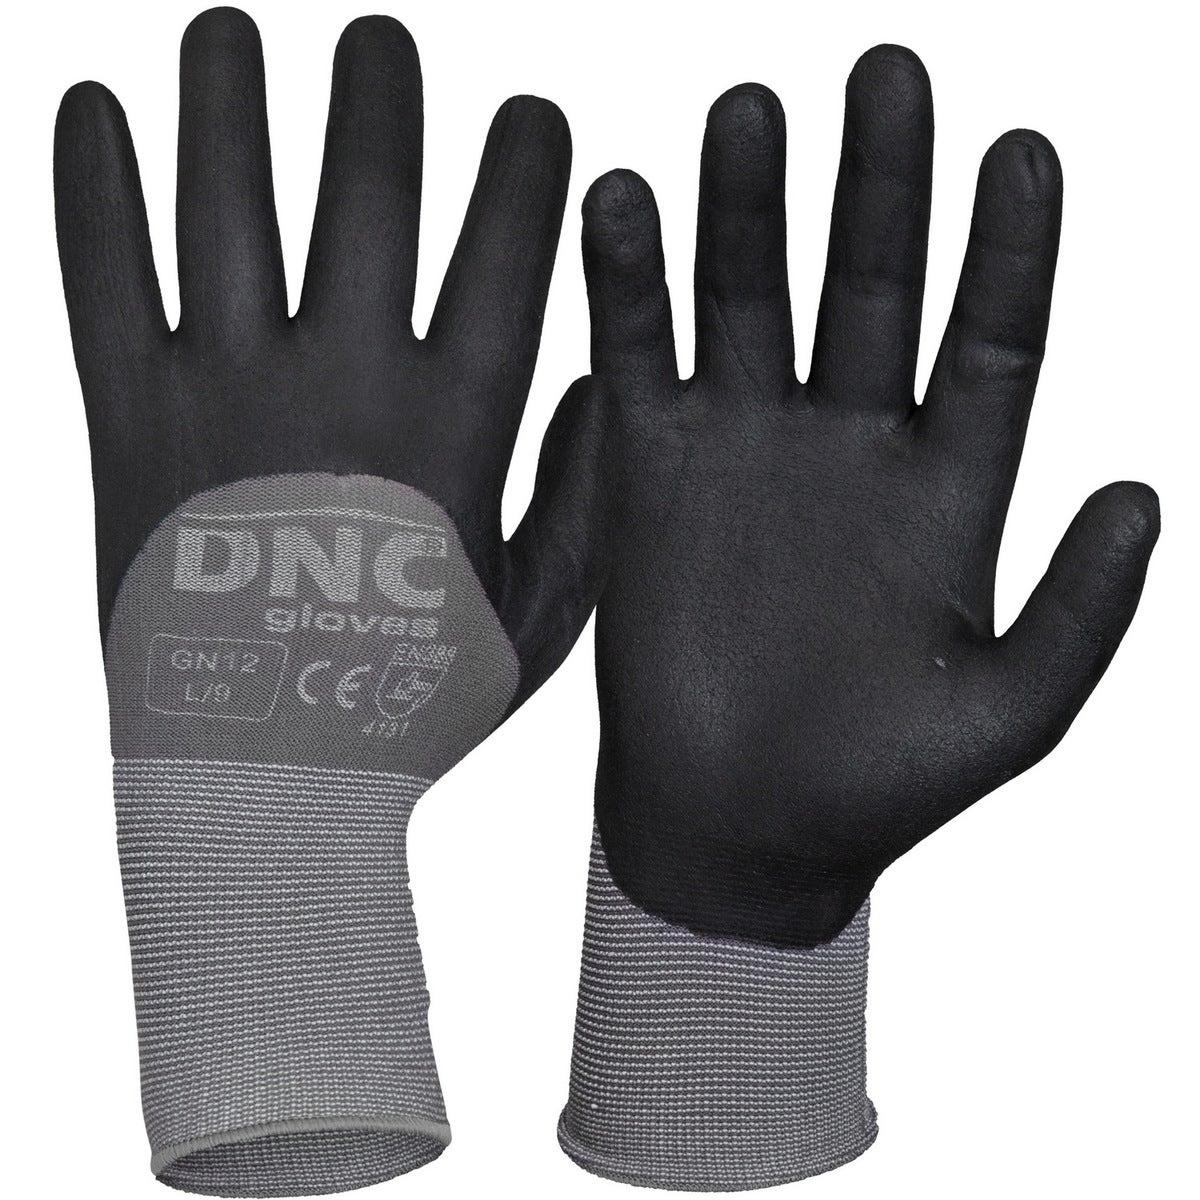 DNC Premium Nitrile Supaflex 3/4 Coating - Black/Grey - 2XL